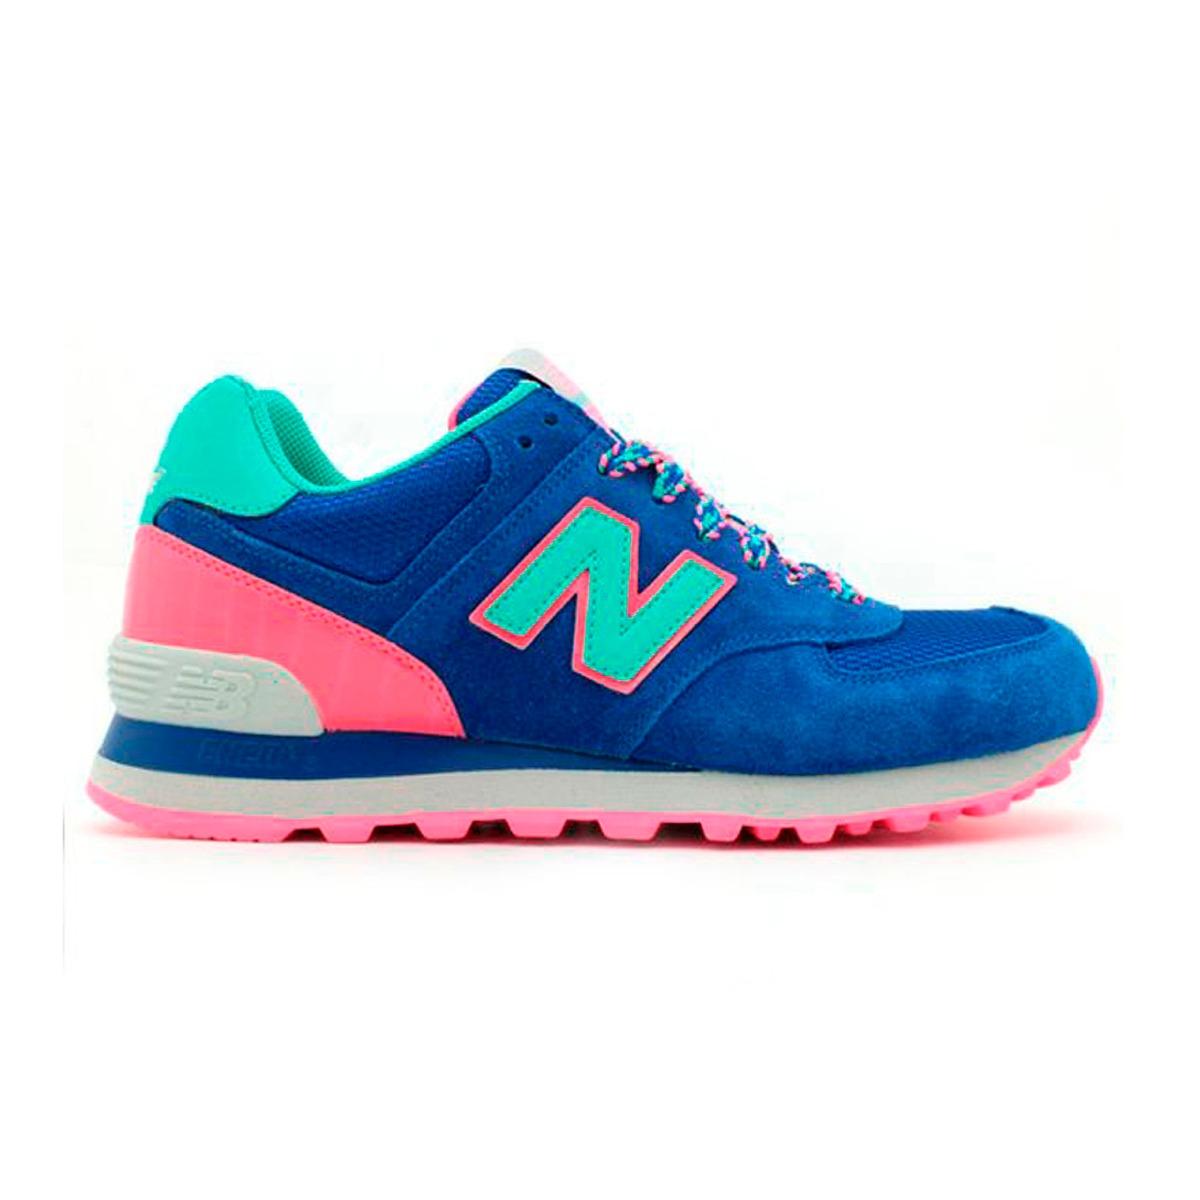 new balance mujer 574 rosa y azul